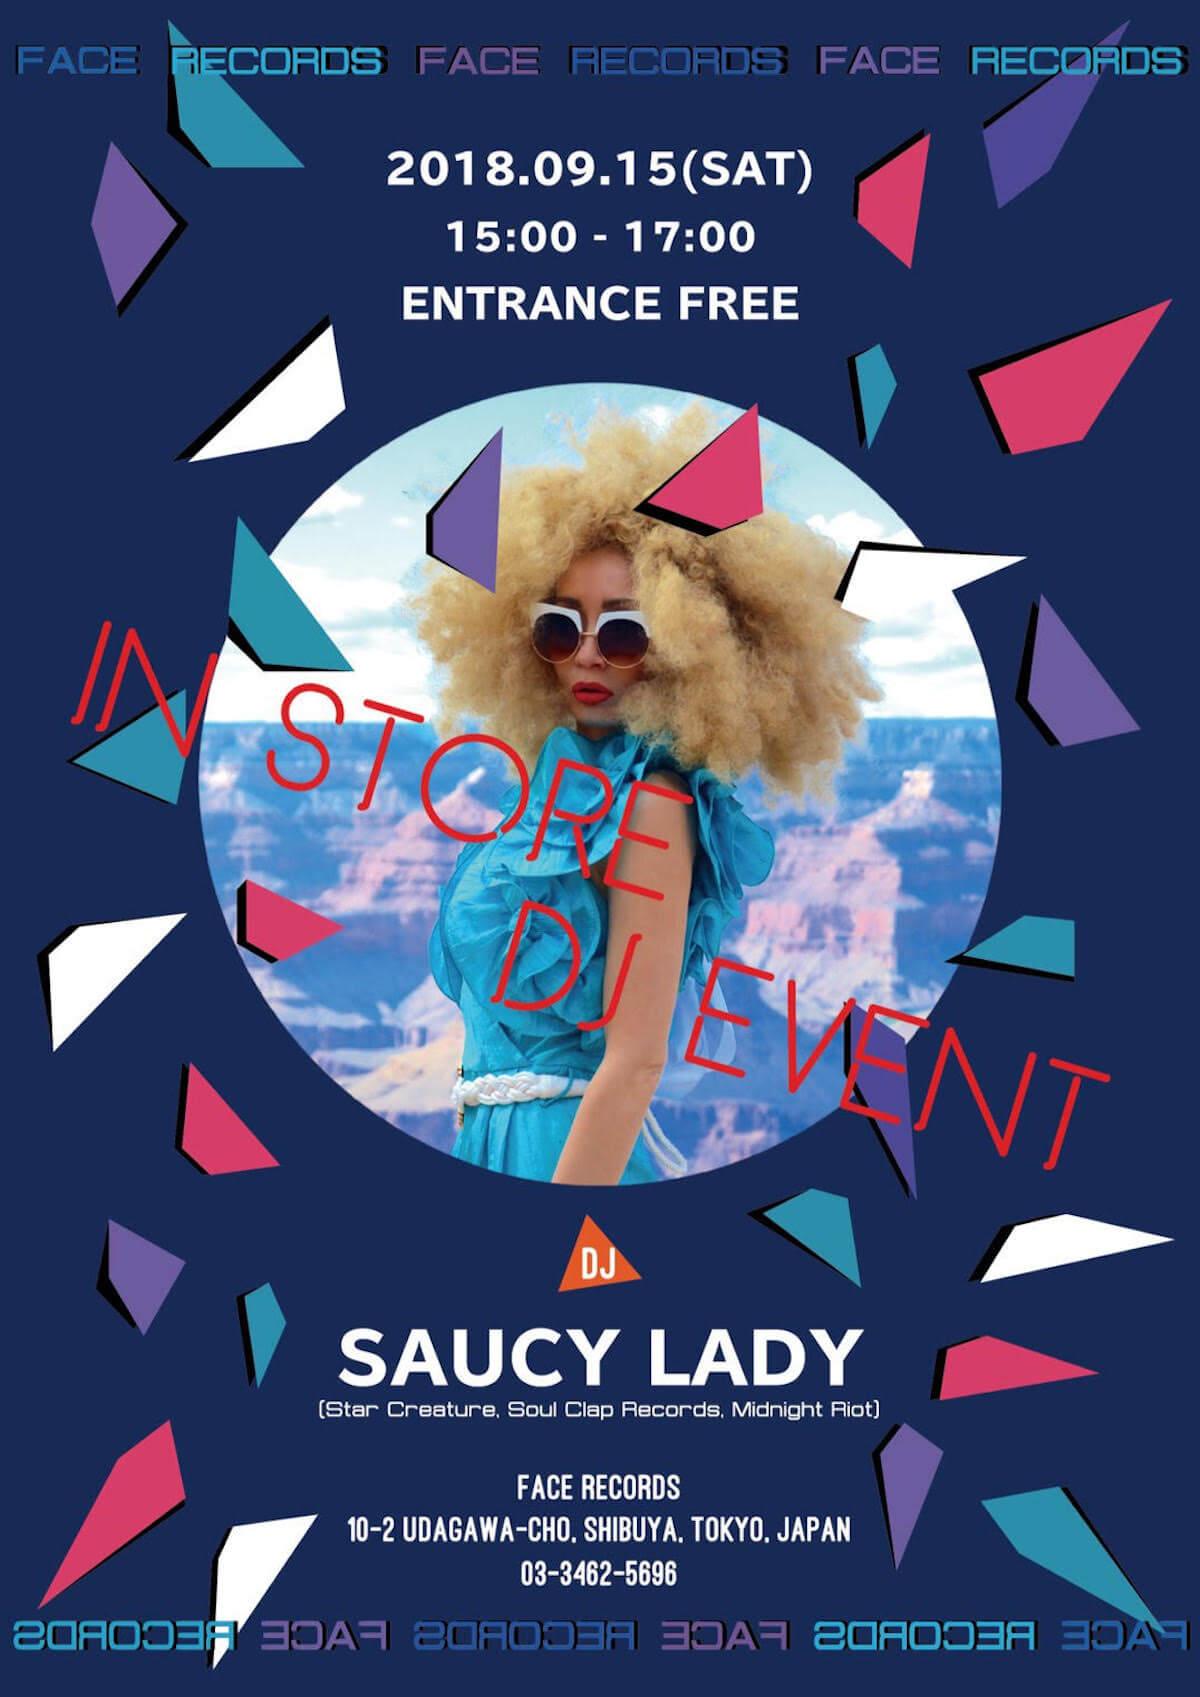 FACE RECORDSがDJ・SAUCY  LADYを迎えインストアDJイベントを開催! music180914_facerecords_03